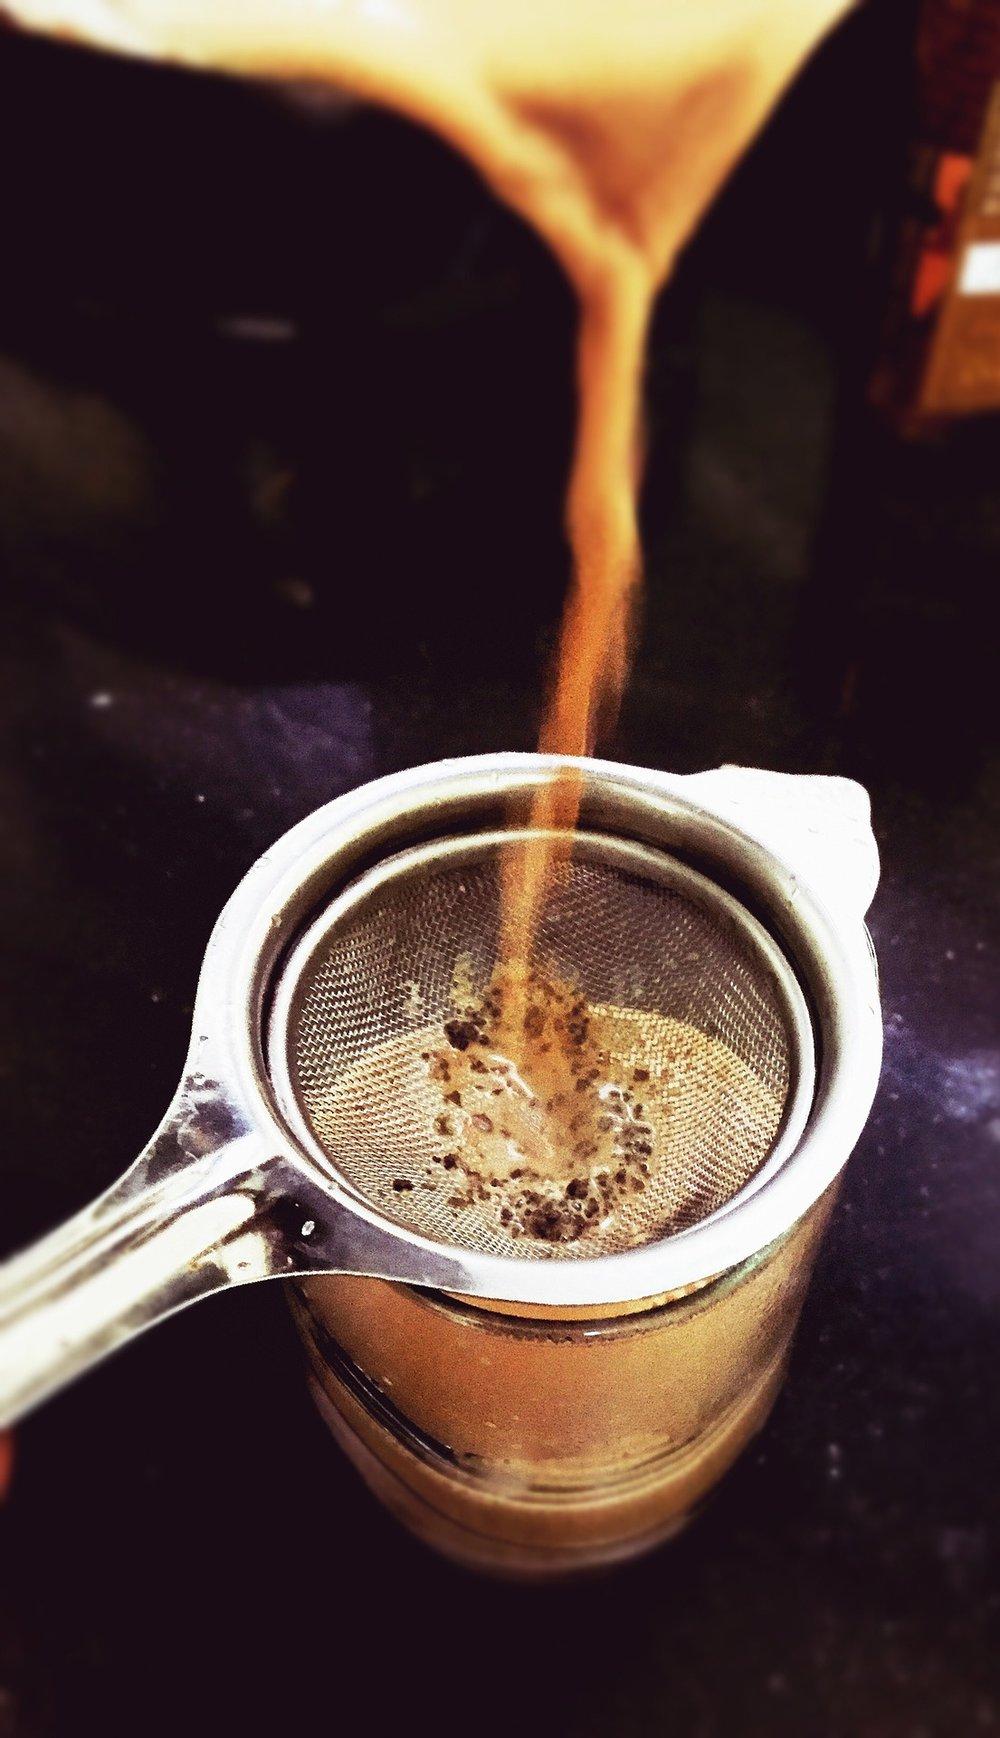 cup-932303_1920 (1).jpg